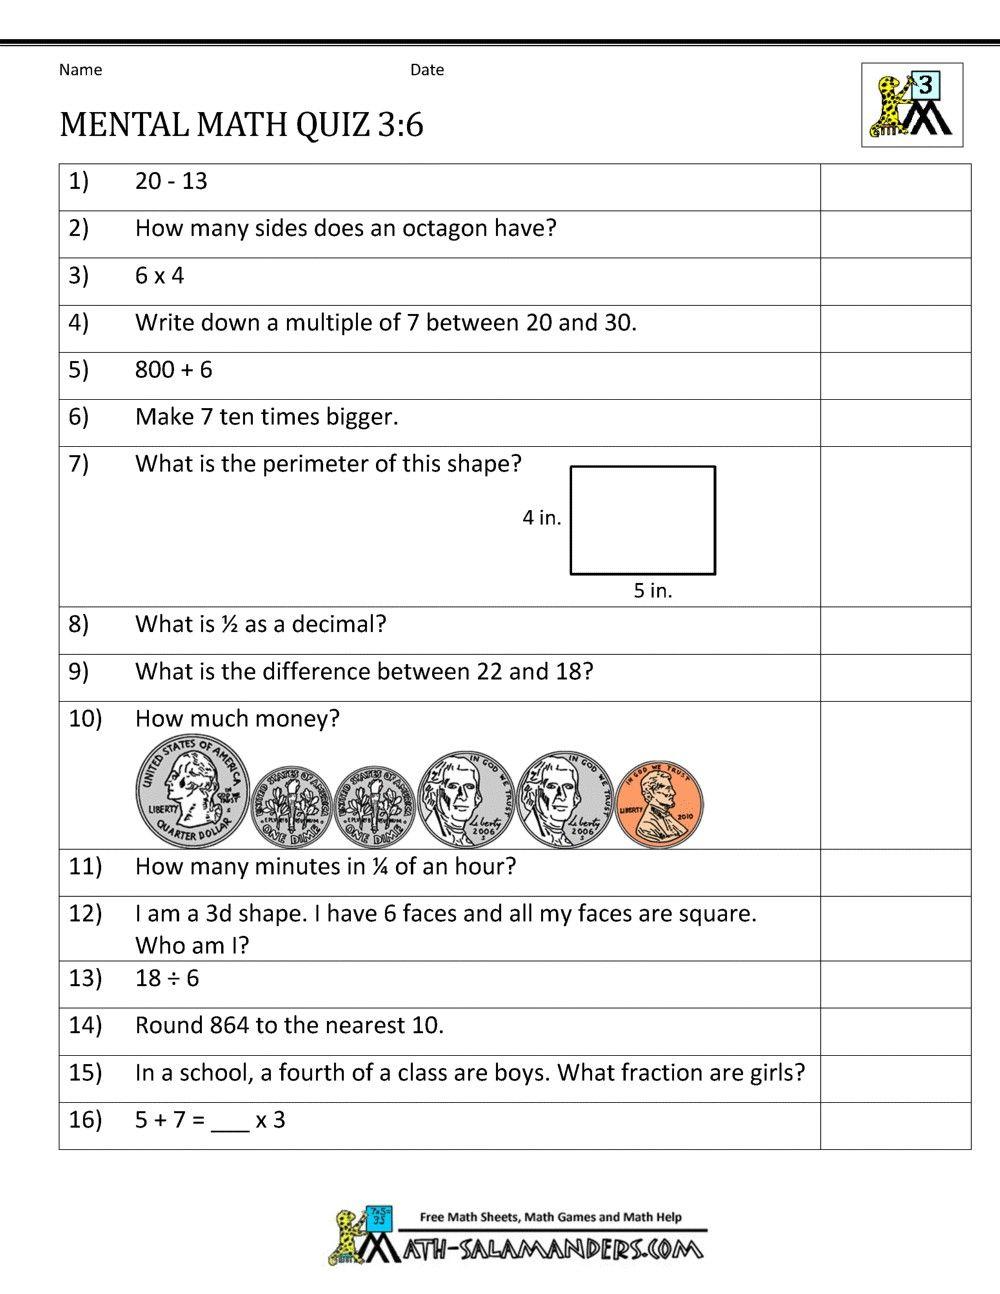 medium resolution of 3 Worksheet Free Math Worksheets Third Grade 3 Measurement Units Of Length  Mental Math 3rd Gr...   Mental maths worksheets